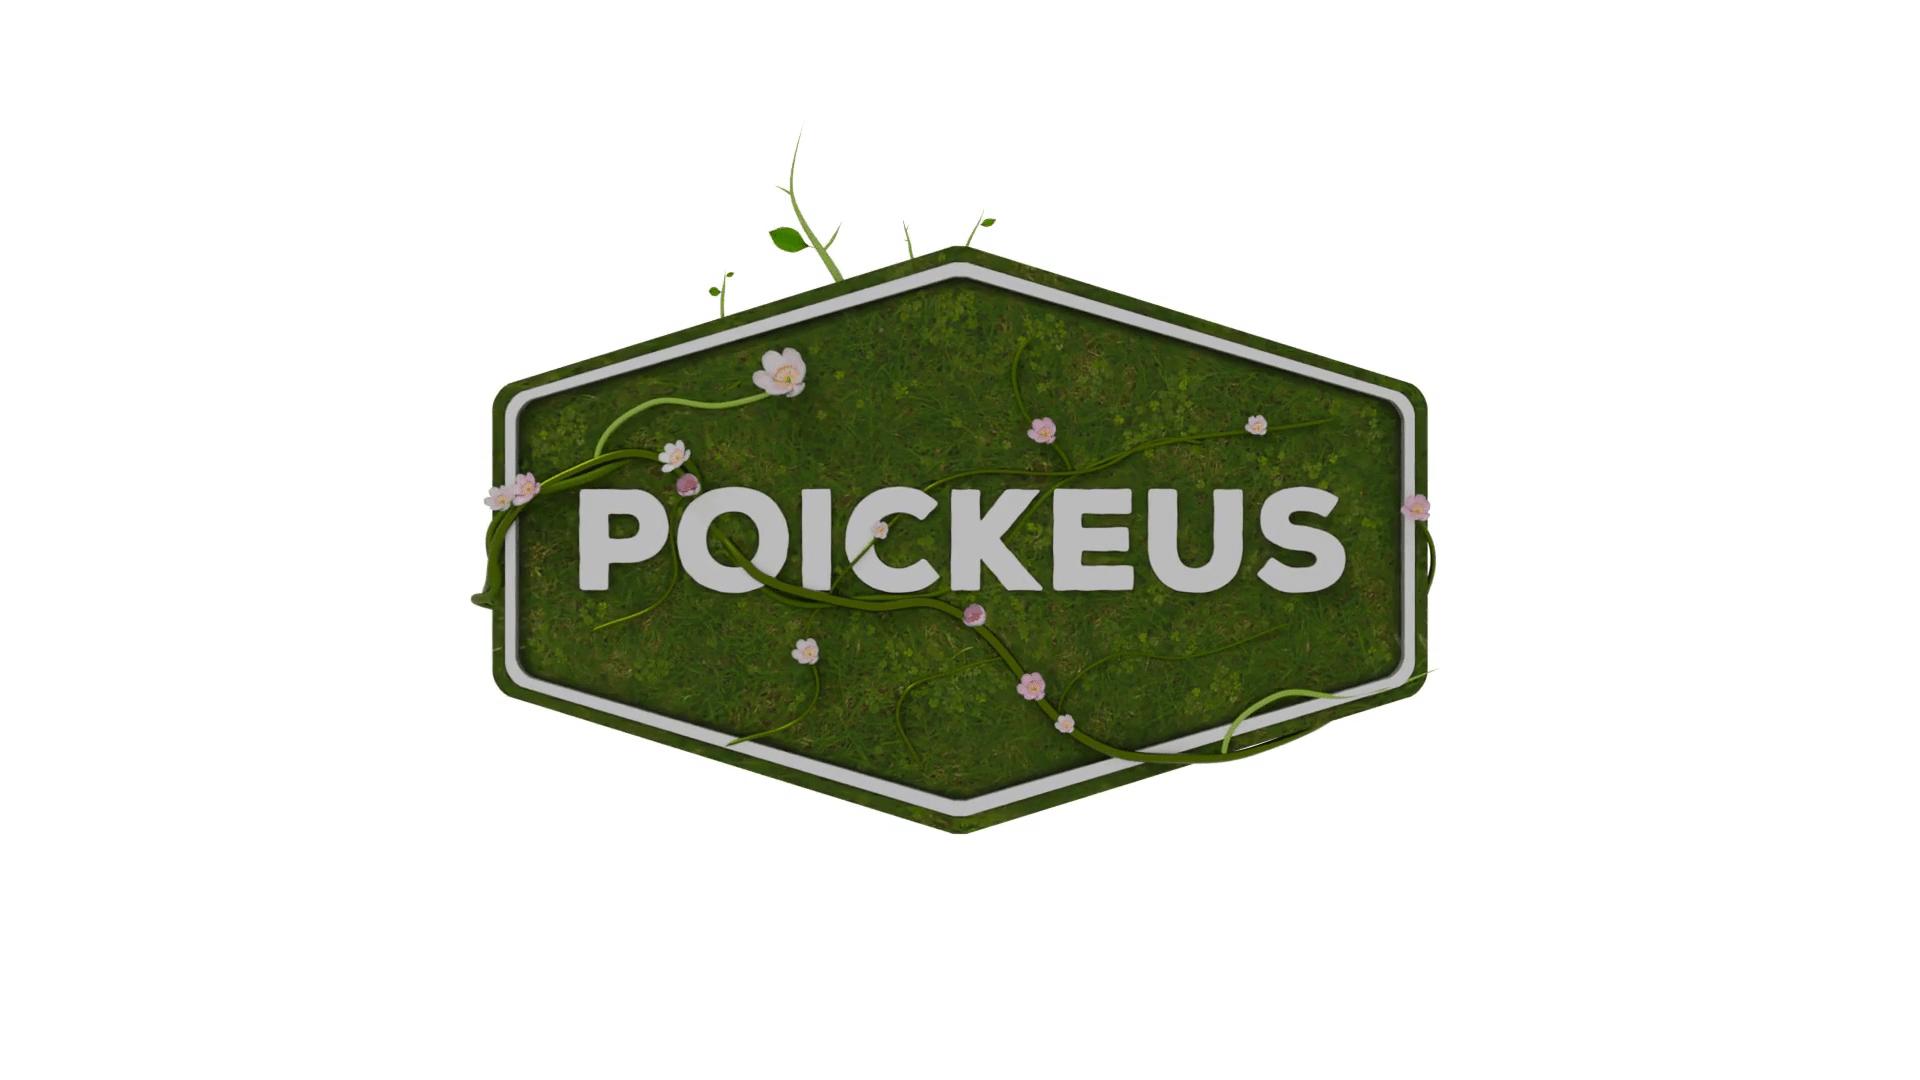 Poickeus logo ekologinen 3D-animaatio